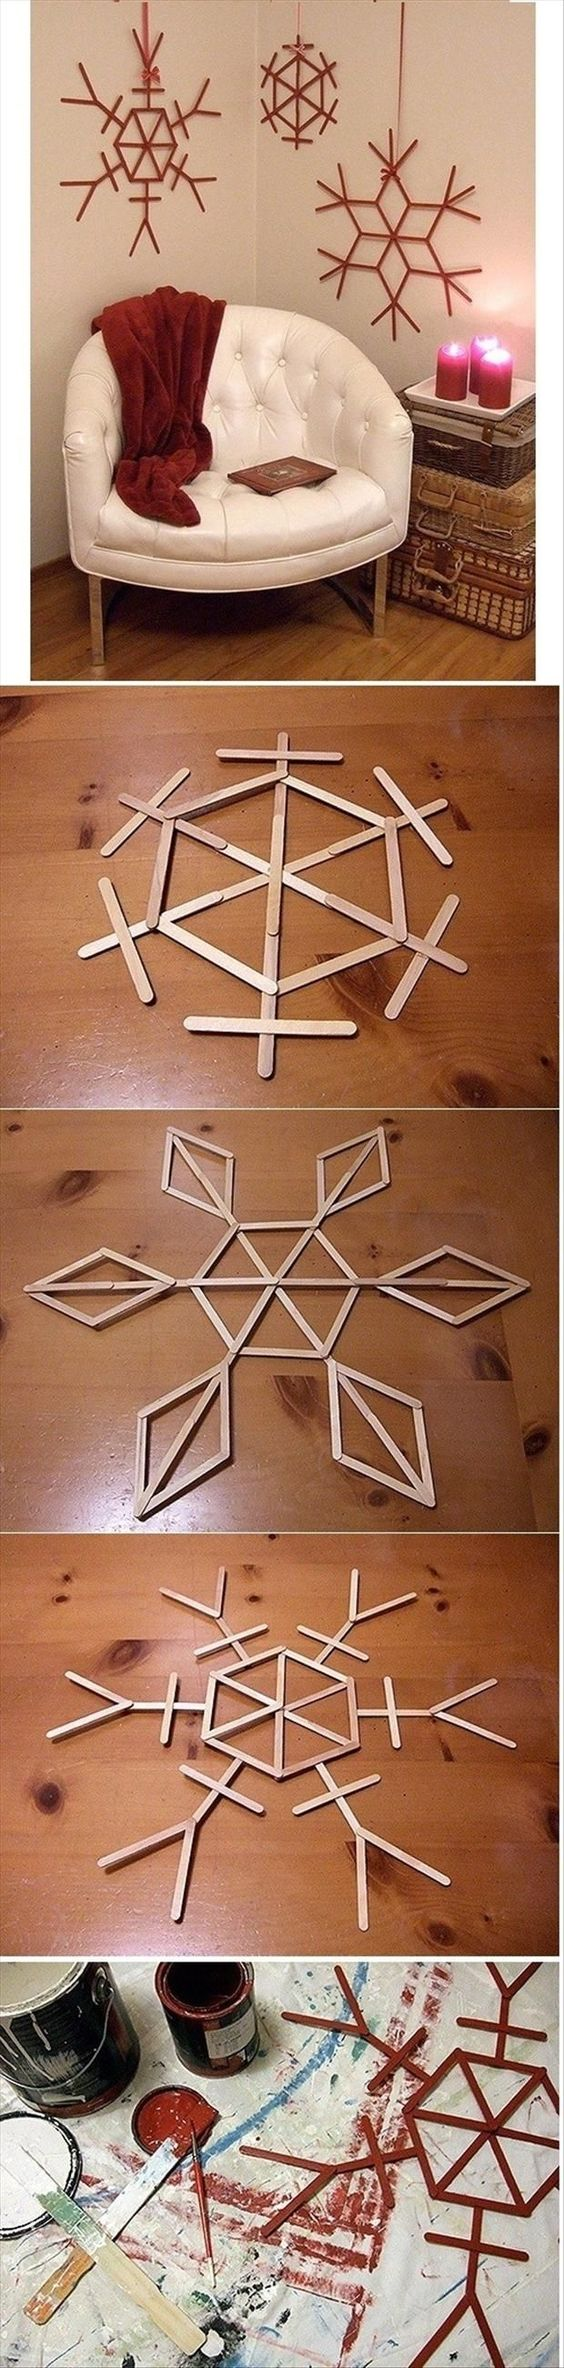 Festive Popsicle Stick Snowflakes.